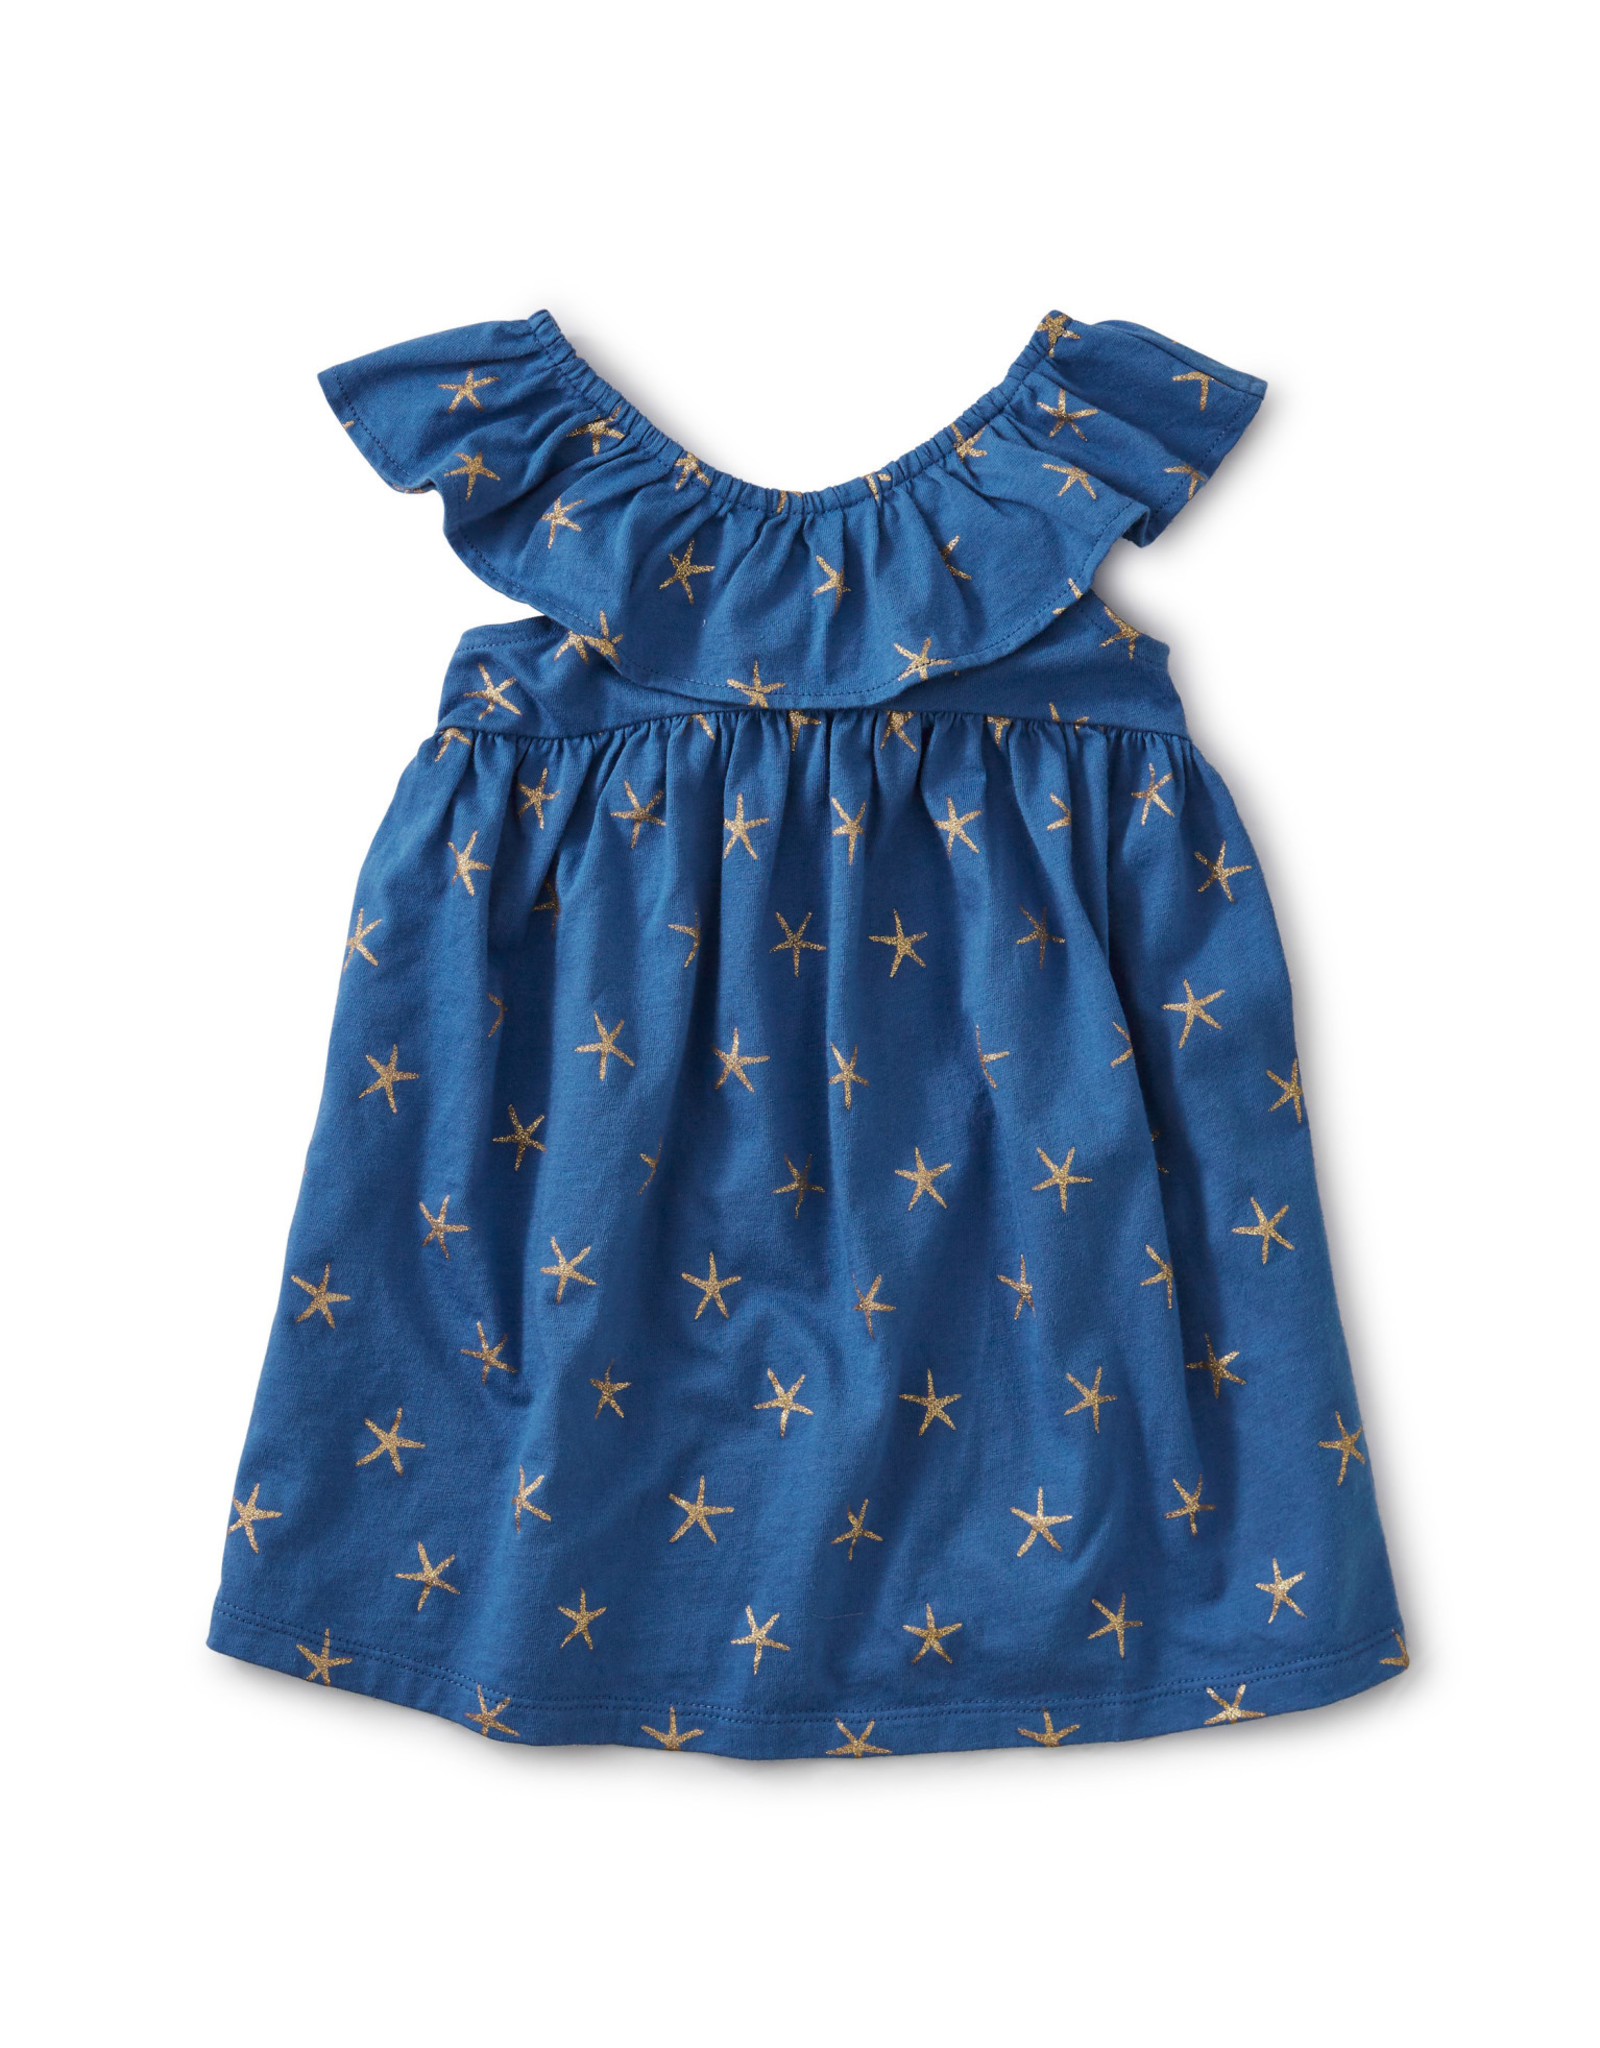 RUFFLE NECK DRESS - SPARKLE STARS BATIK BLUE